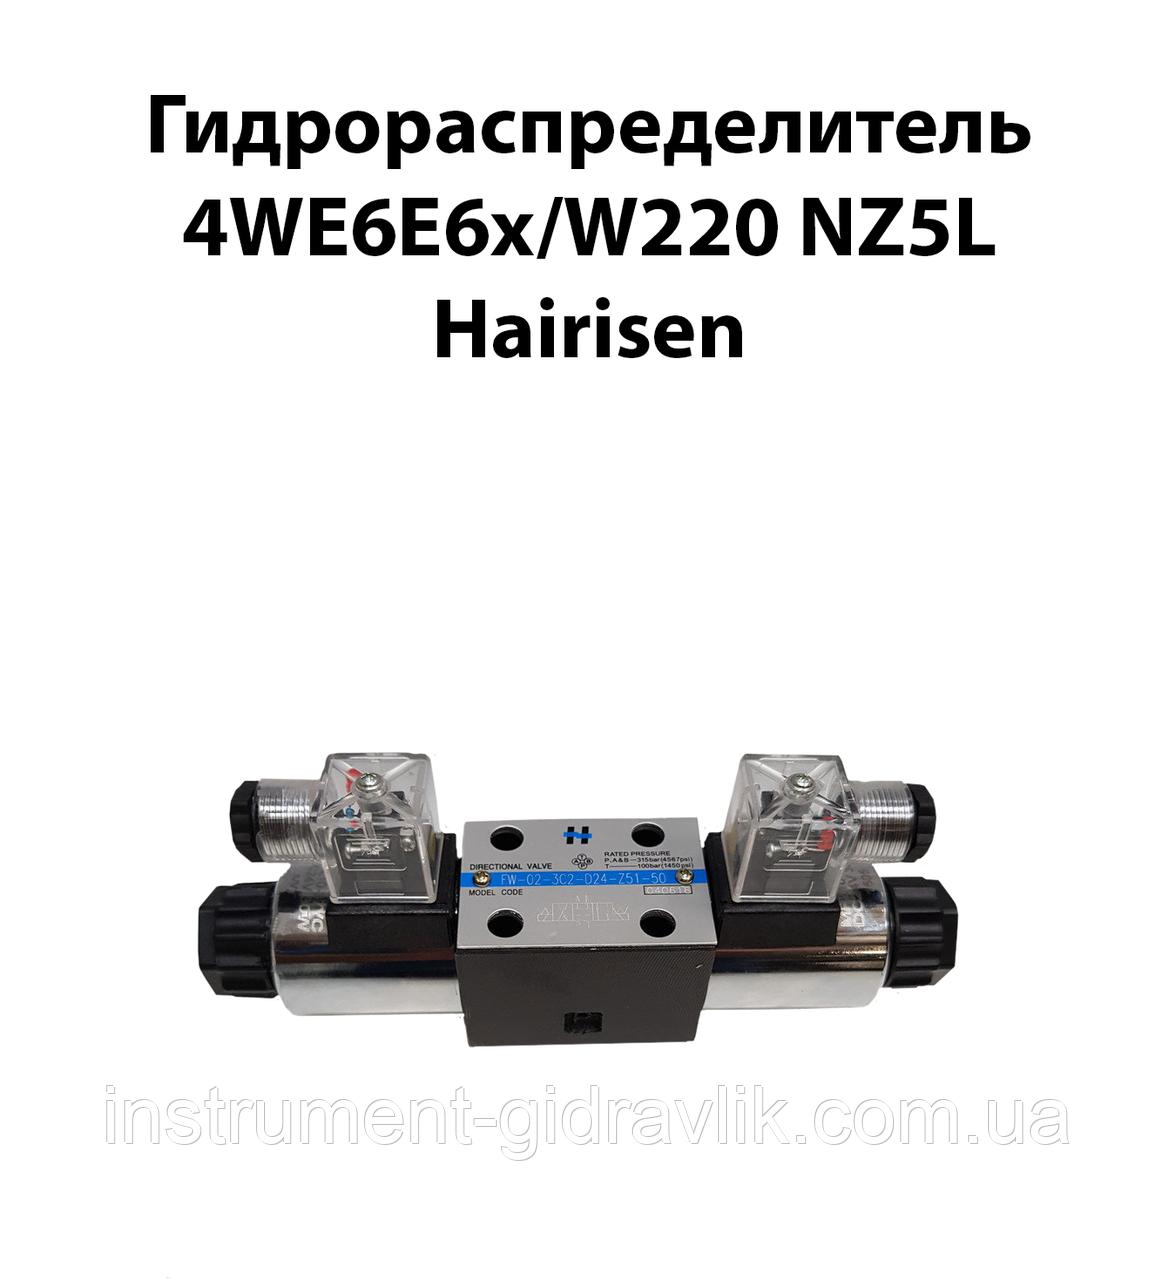 Гидрораспределитель 4WE6E6X/W220 NZ5L HAIRISEN(ВЕ 6 44 220В) Ду 6мм 32МПа 16л/мин